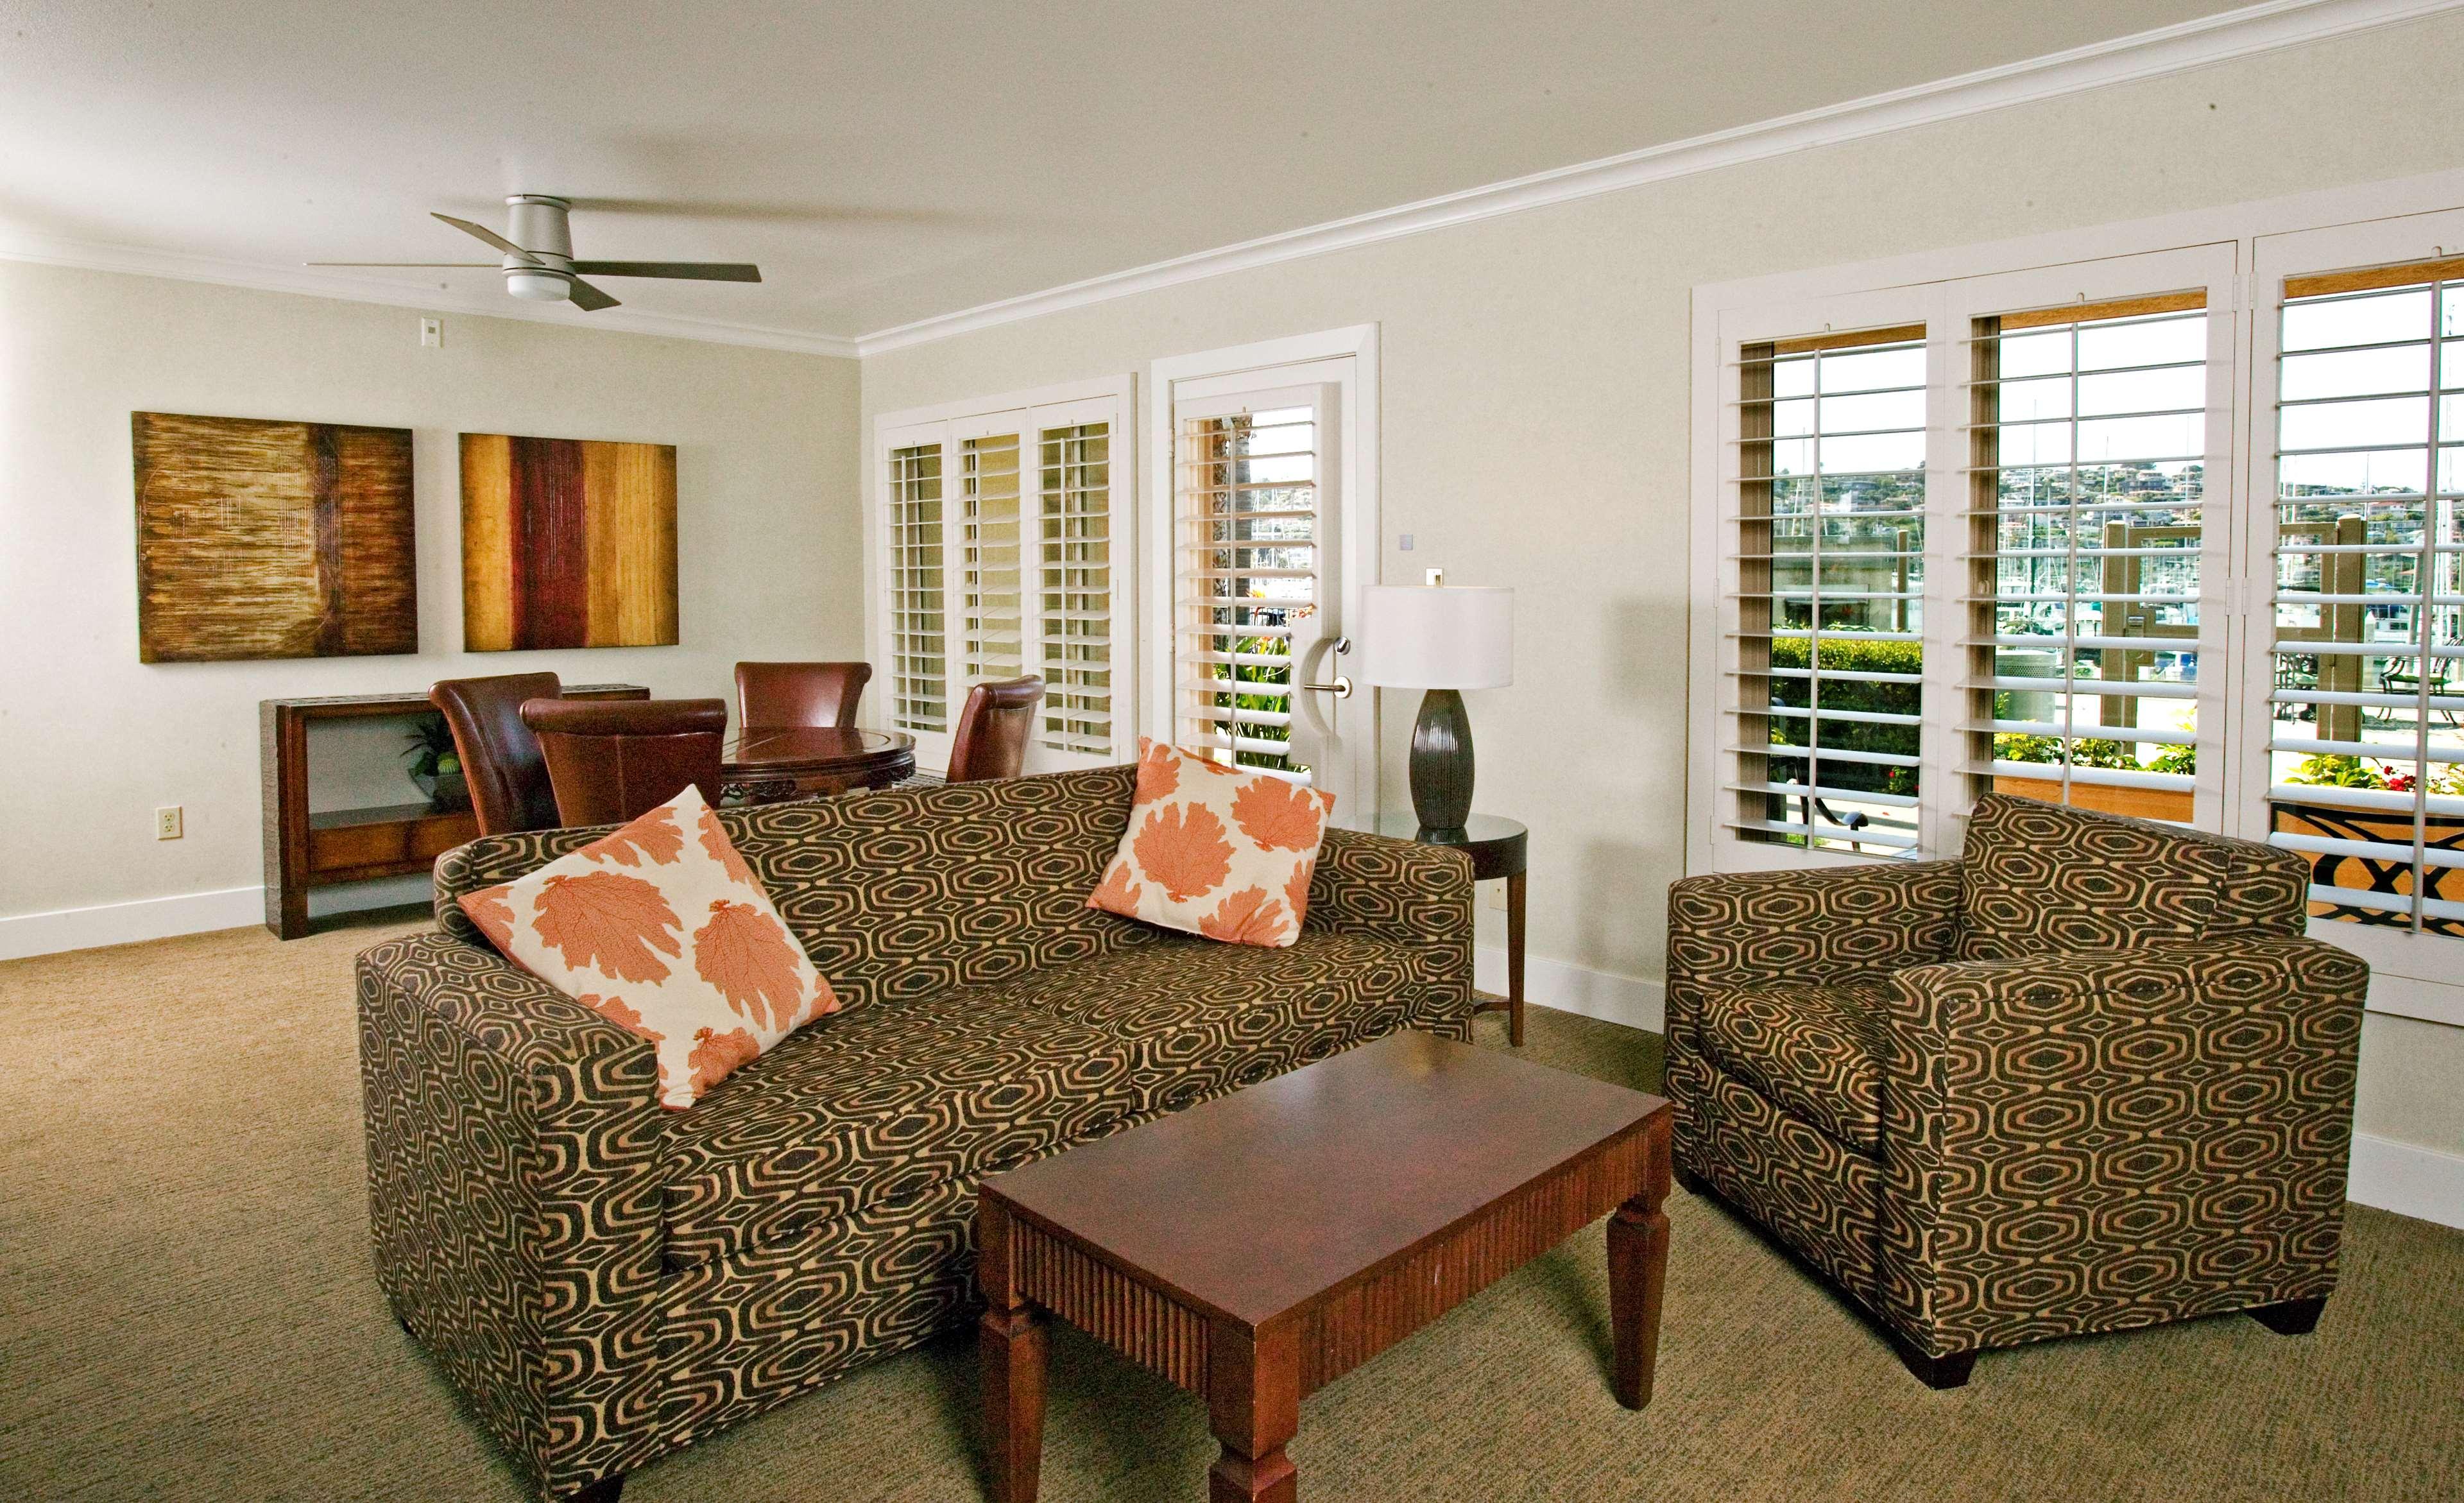 Best Western Plus Island Palms Hotel & Marina image 18